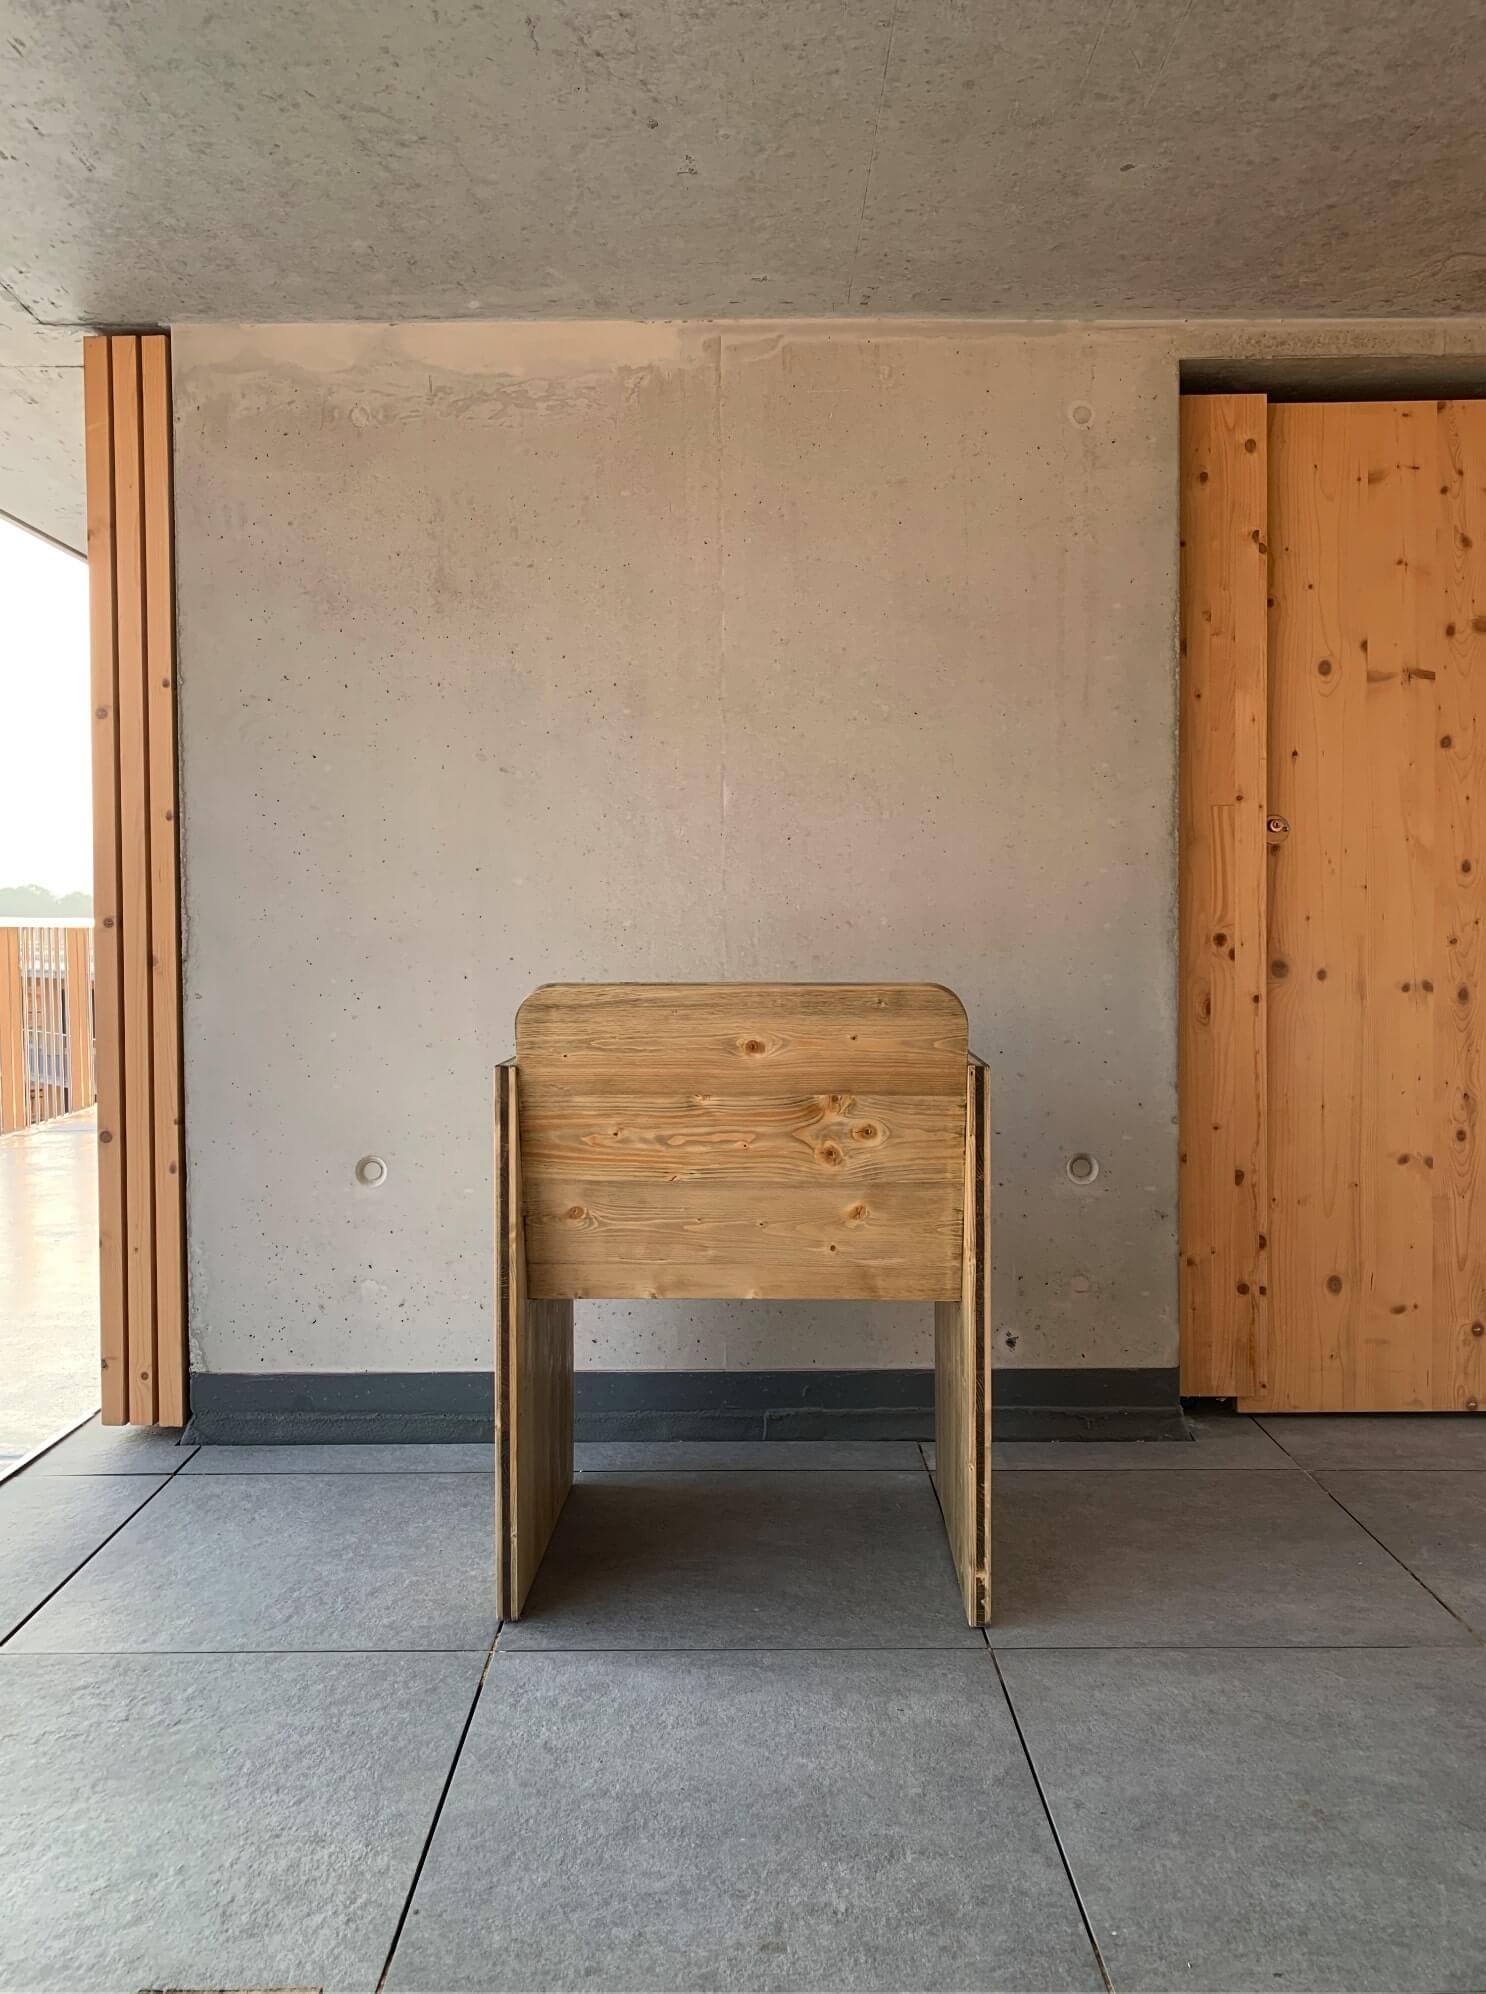 simple wooden natural furniture material